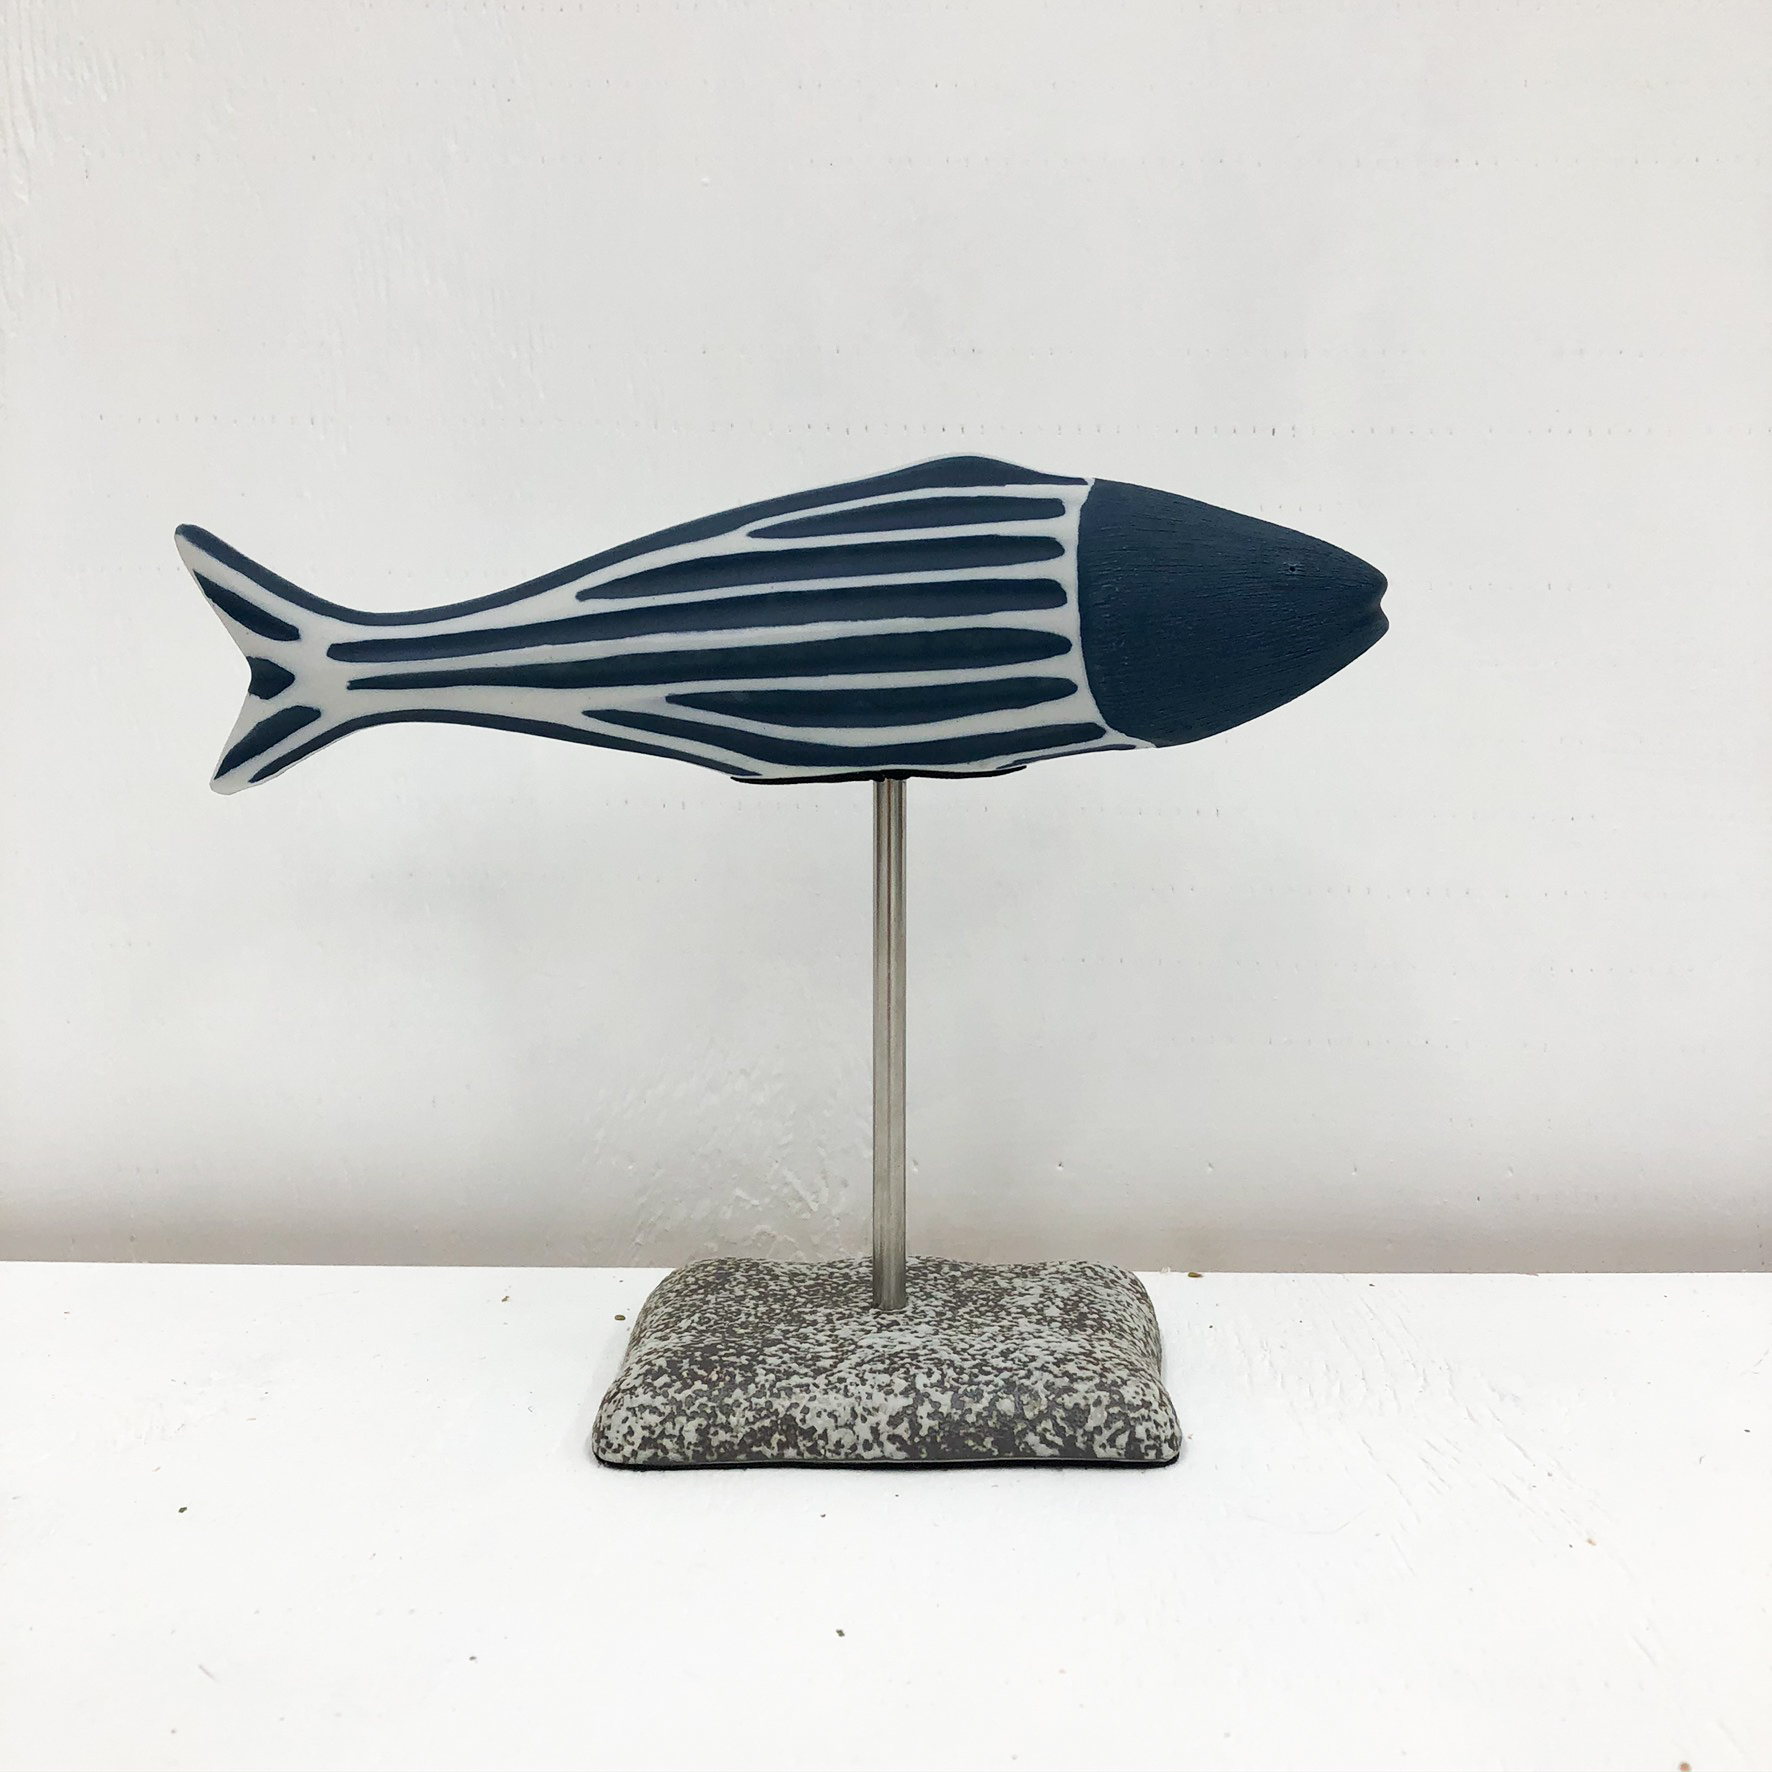 Adrian S Handmade Vase - Navy Fish